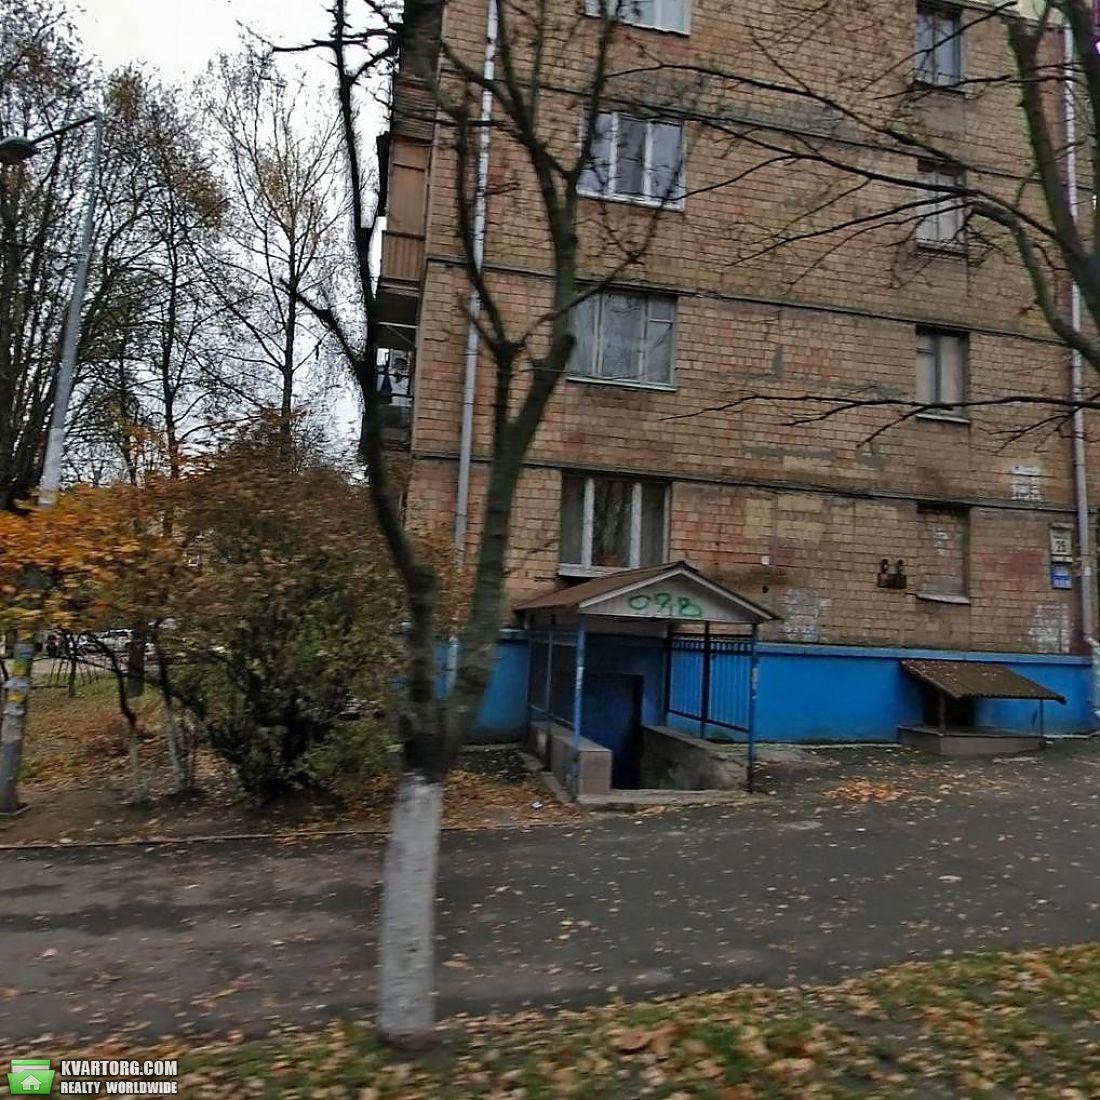 продам 1-комнатную квартиру. Киев, ул. Уманская 25. Цена: 29000$  (ID 1793930) - Фото 3